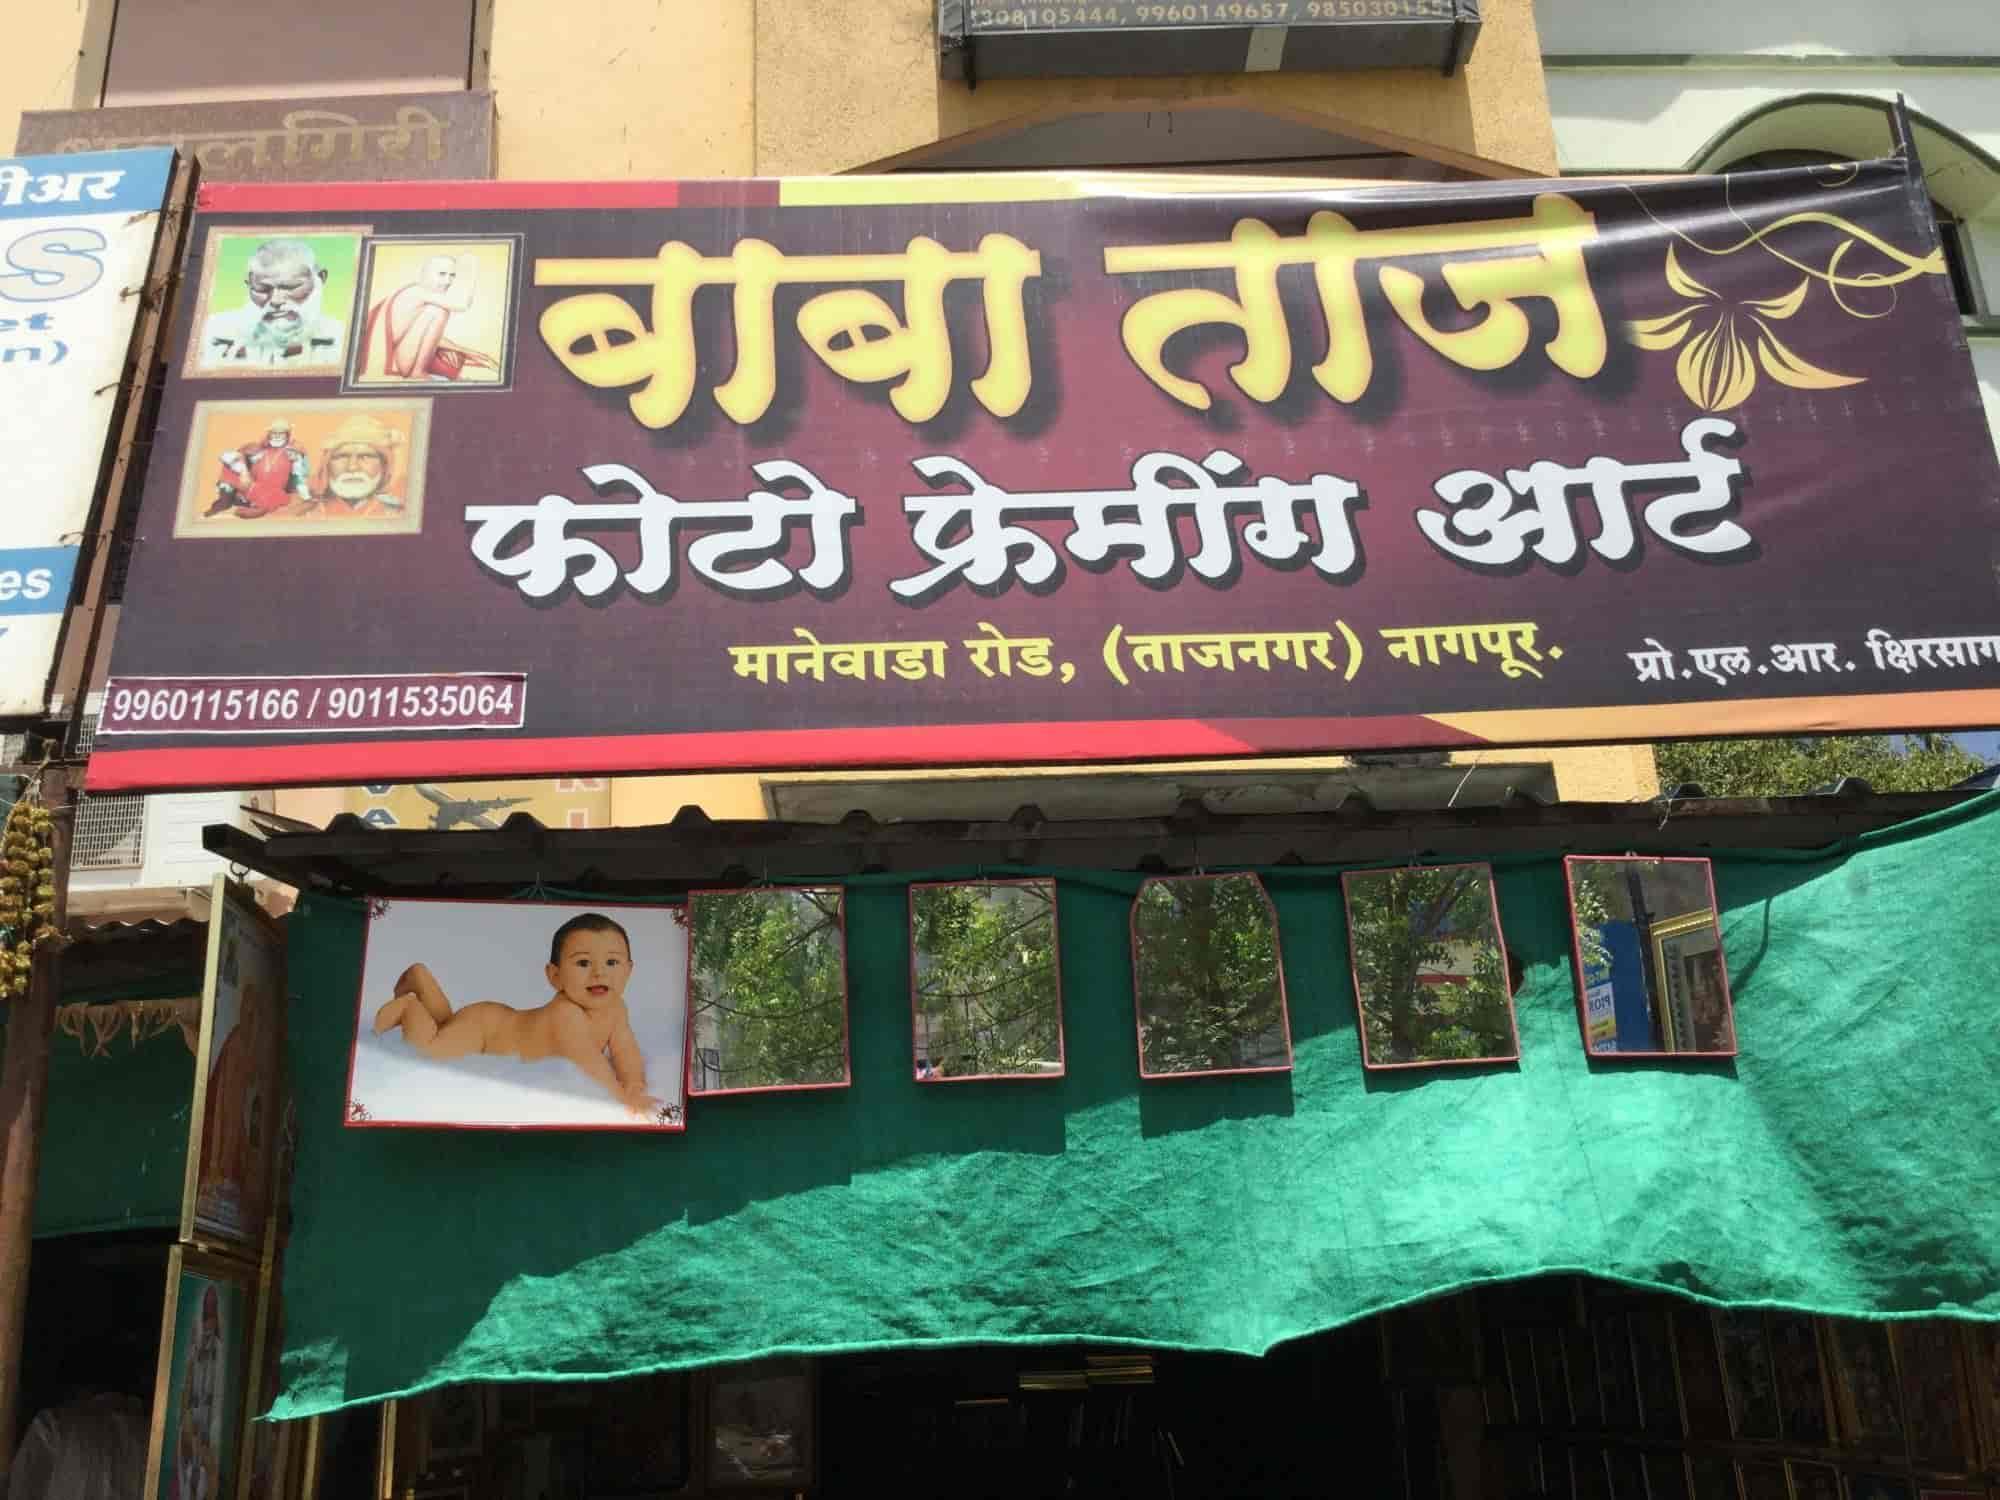 Baba Taj Photo Framing Art Photos, Manewada Road, Nagpur